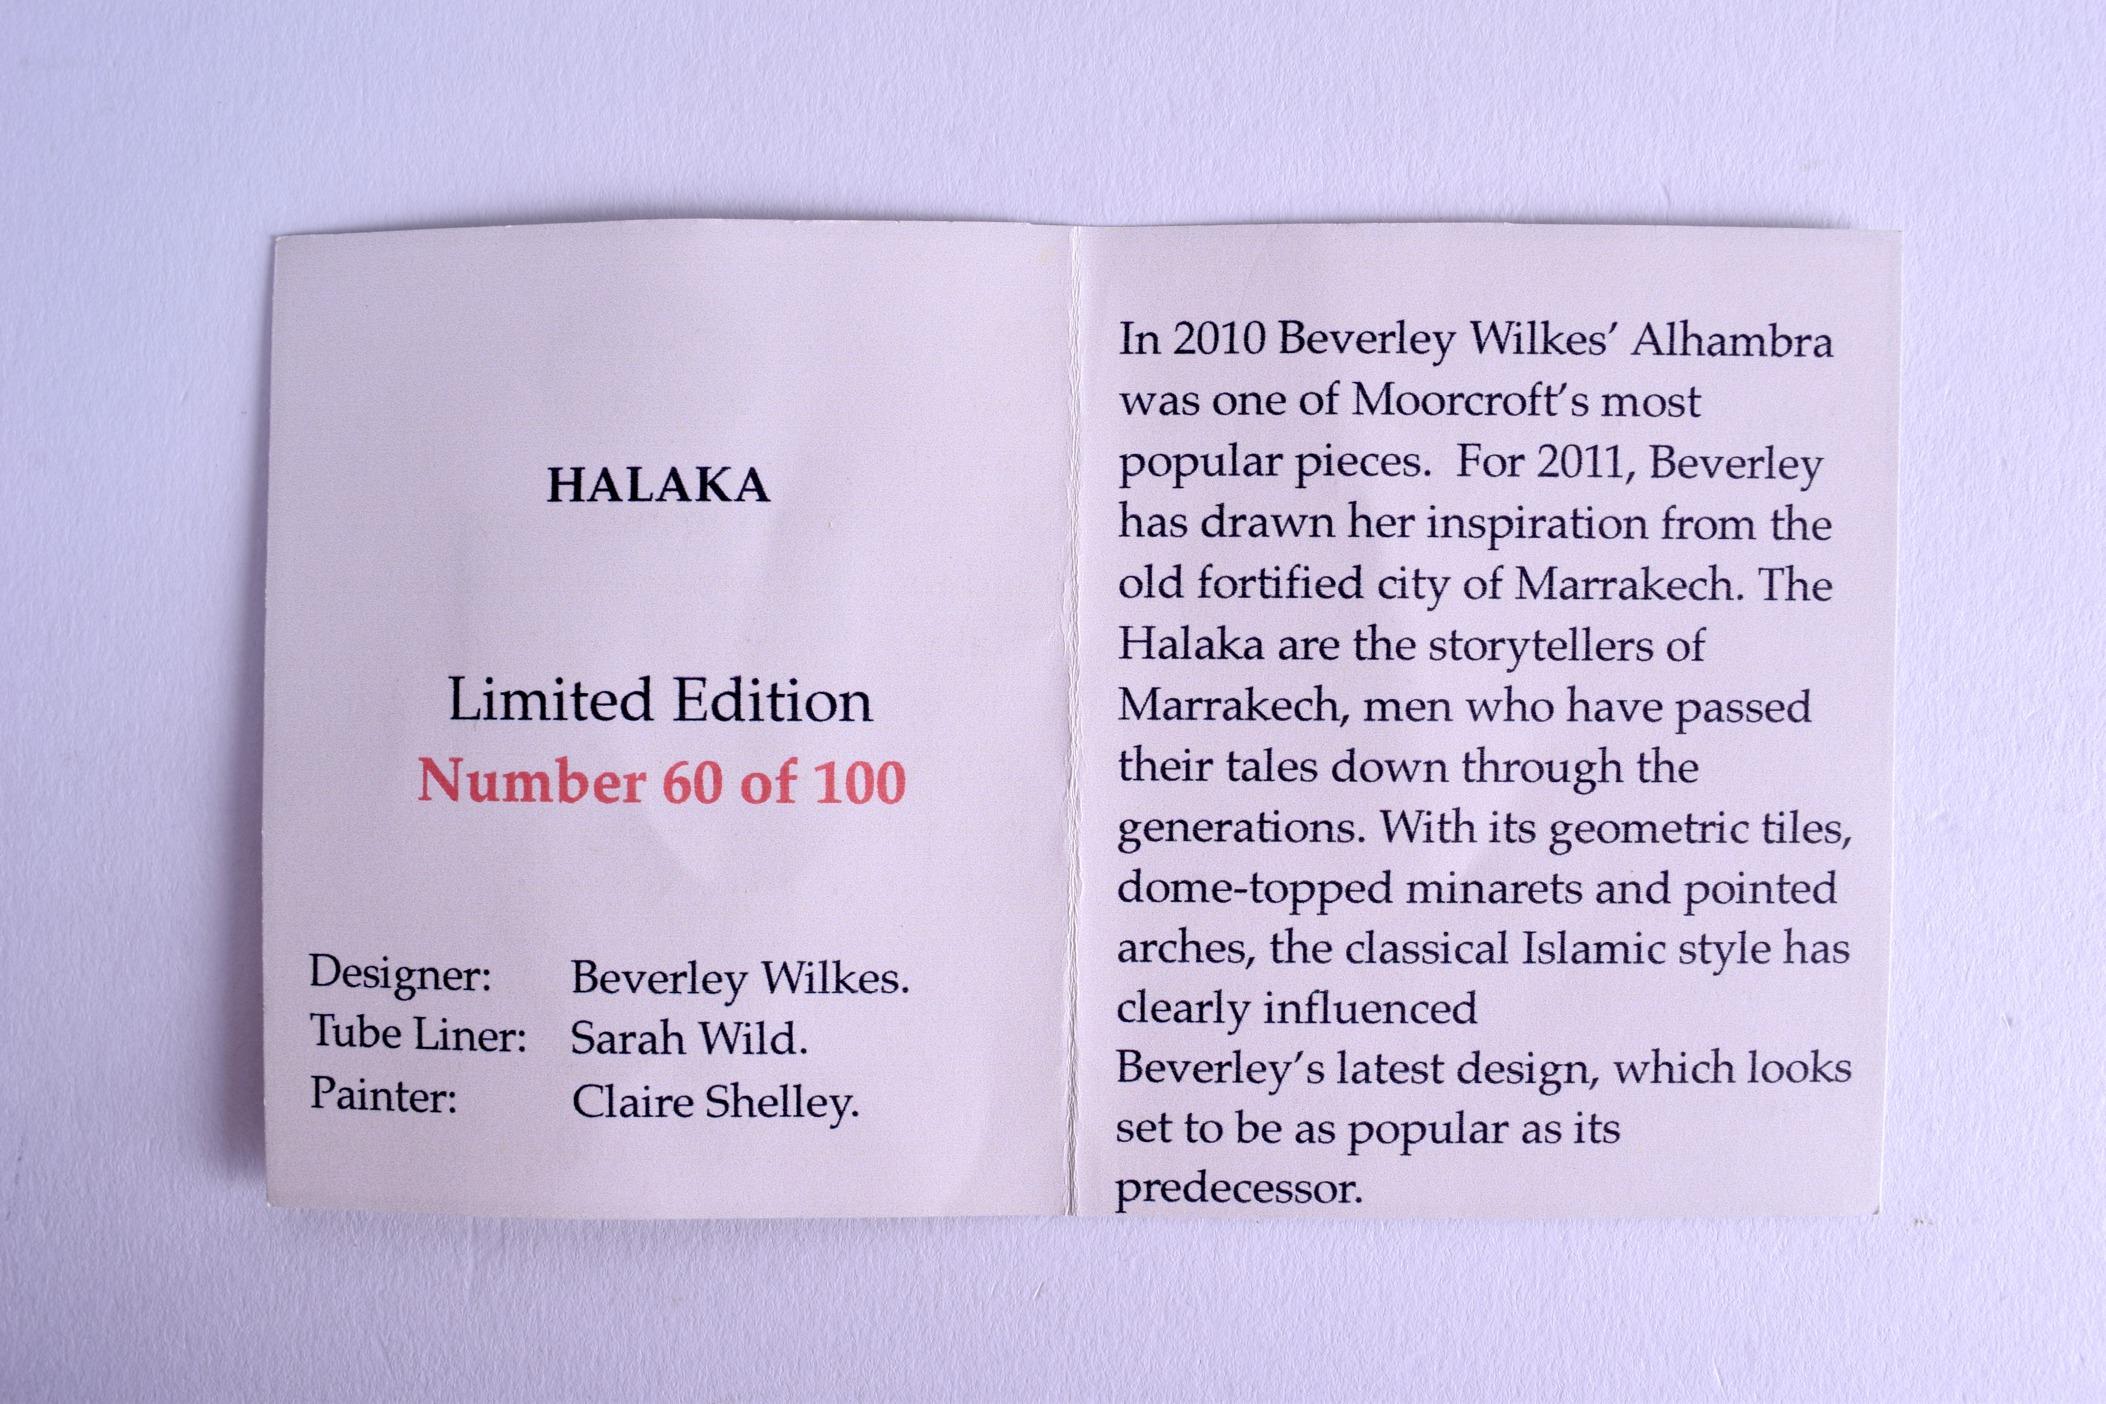 Lot 57 - A MOORCROFT 'HALAKA' VASE designed by Beverley Wilkes. No 60 of 100. 33 cm high.